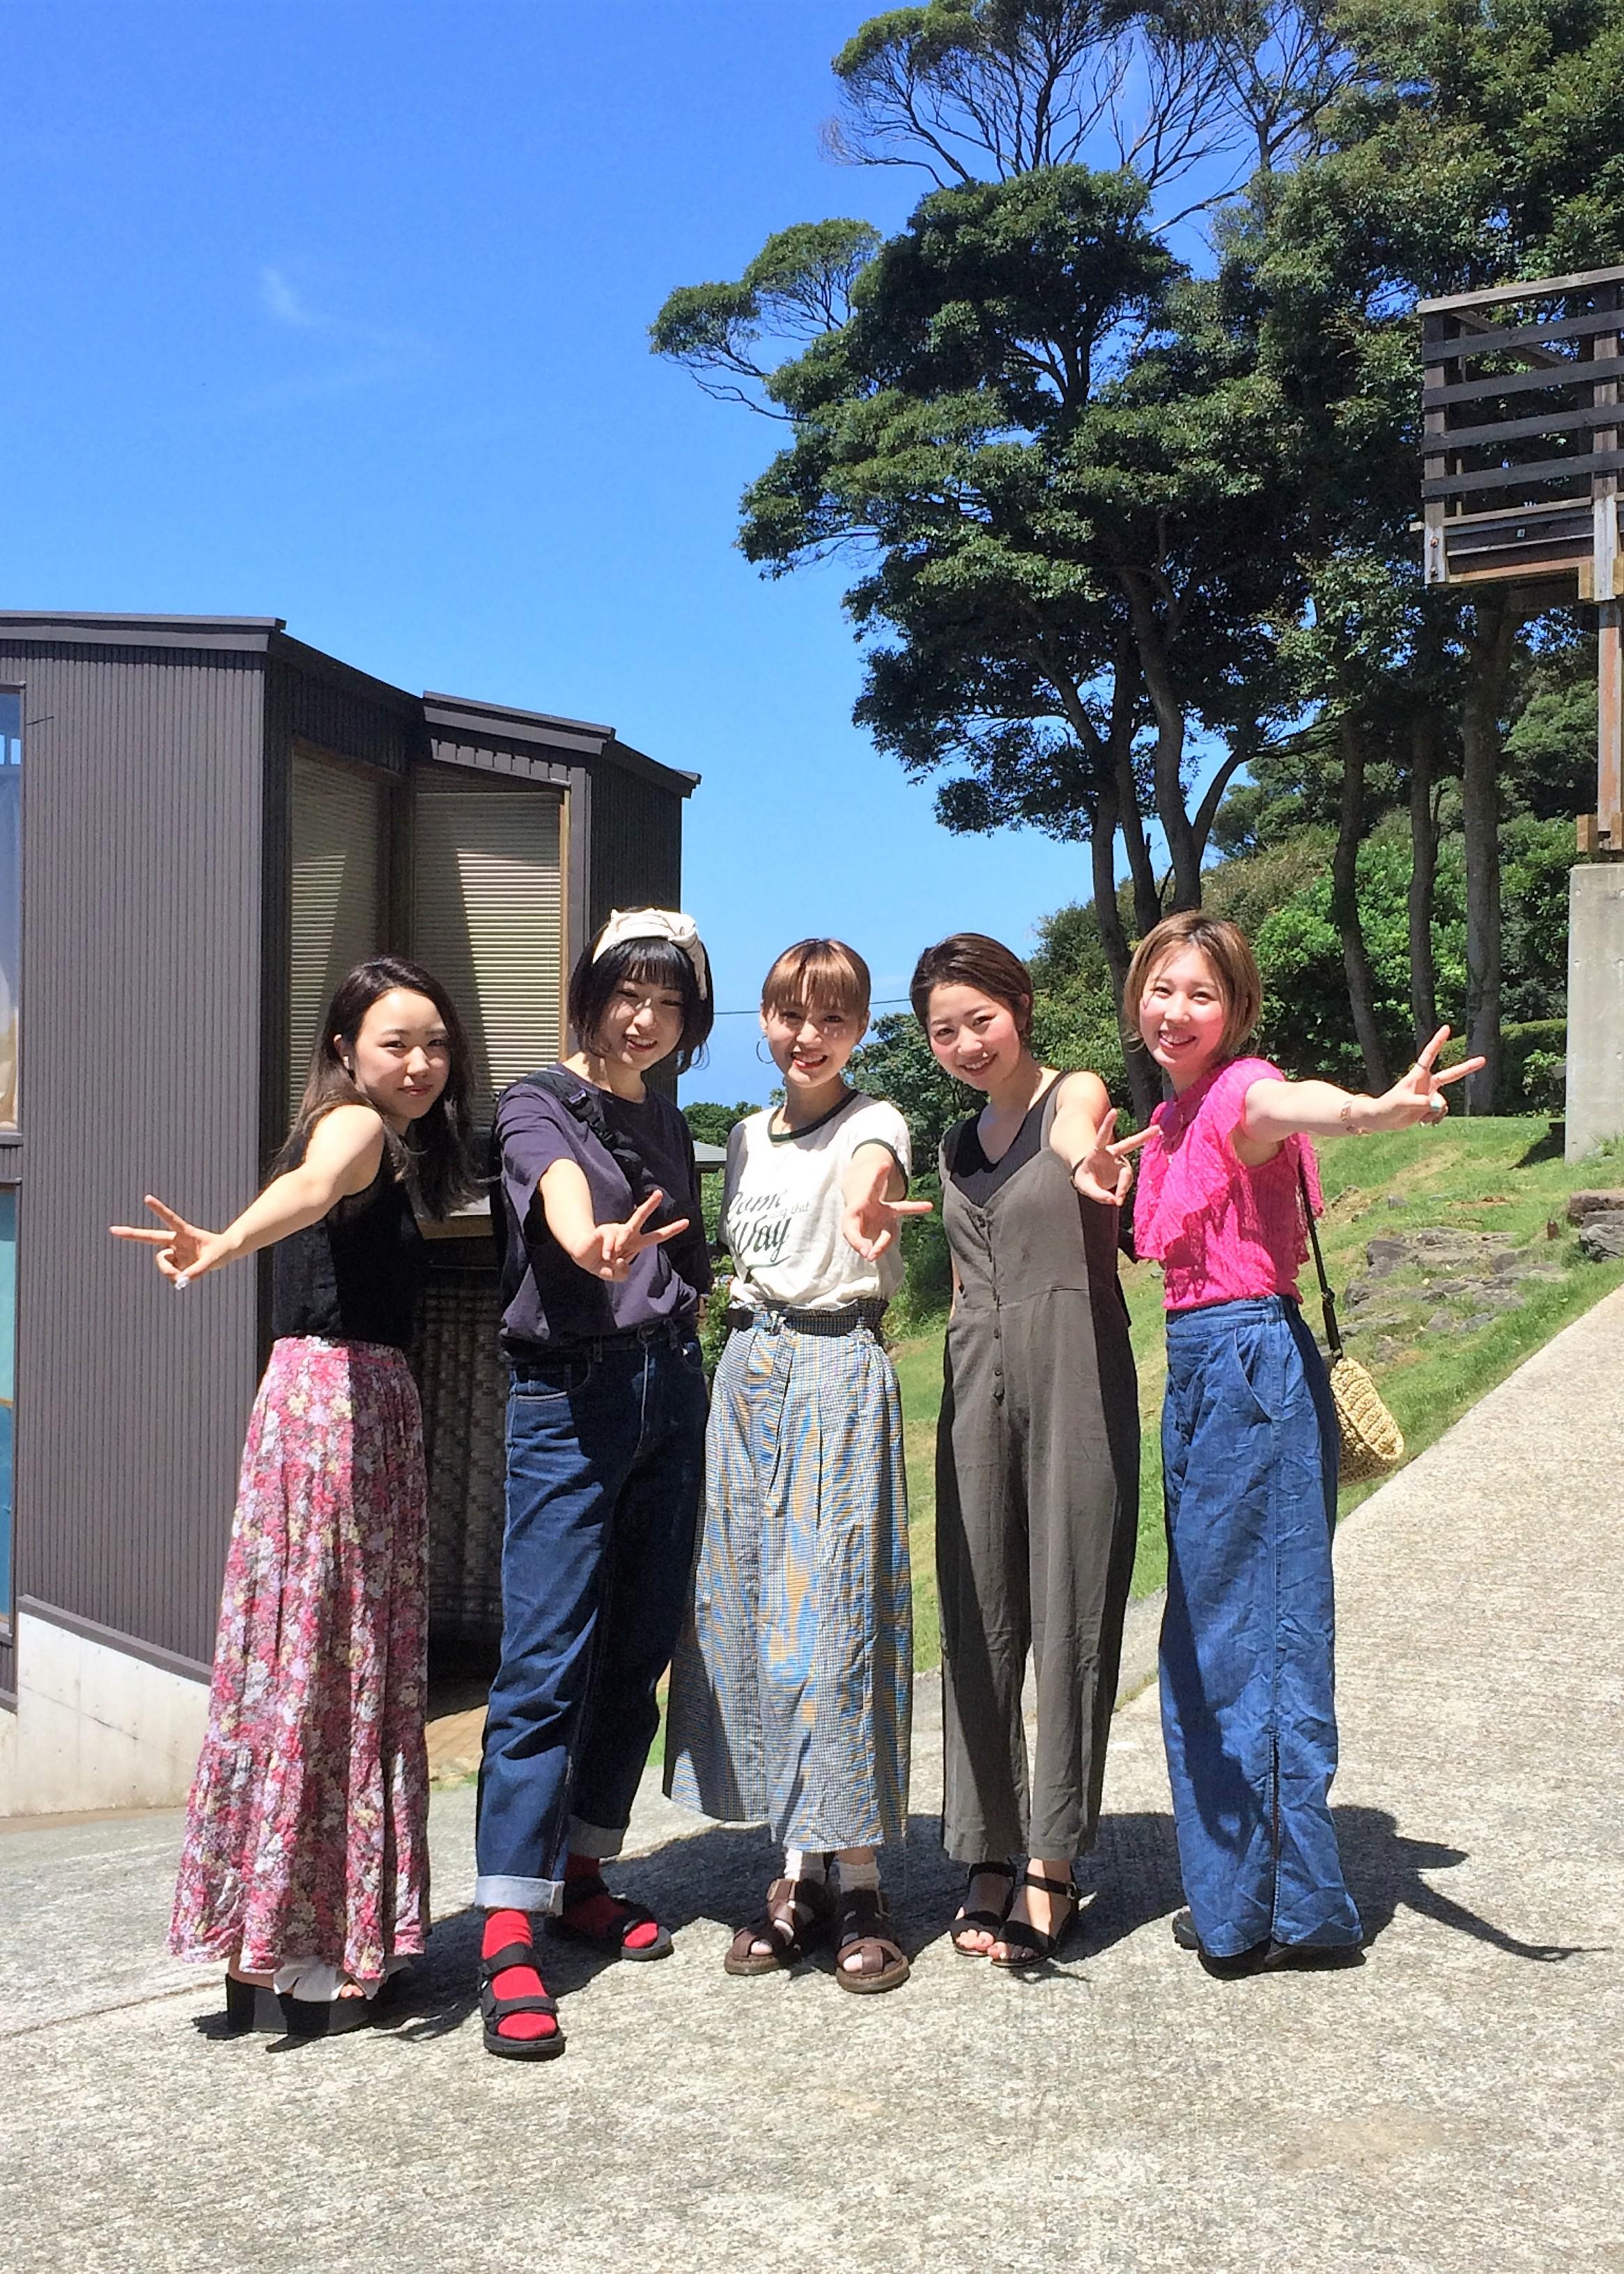 http://www.ashitanokaze2132.com/blog/assets/2018/07/10/IMG_0631.JPG